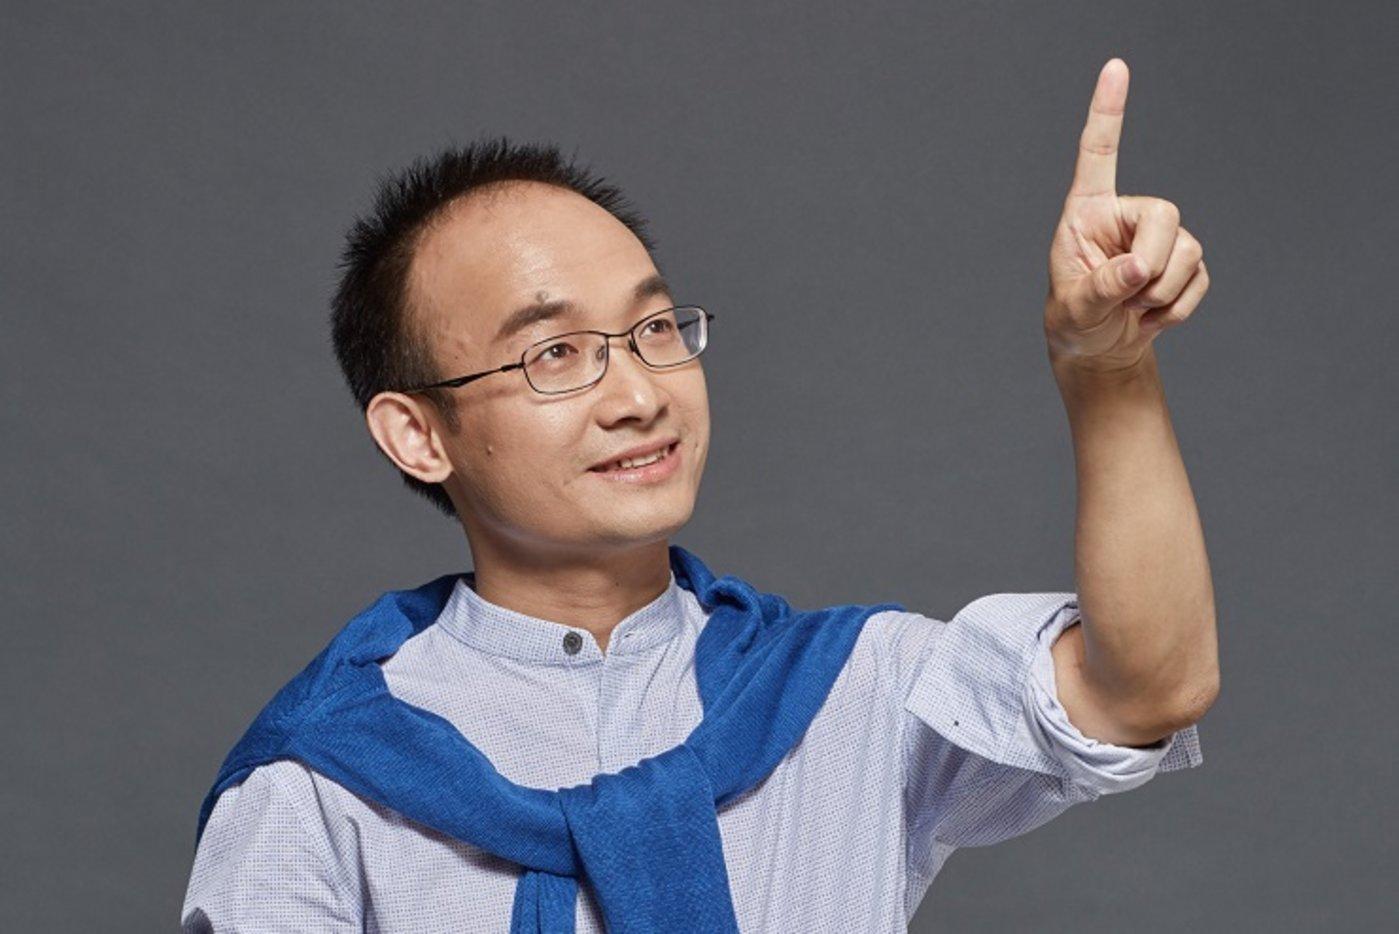 Huang Yunsong, CEO of QingCloud